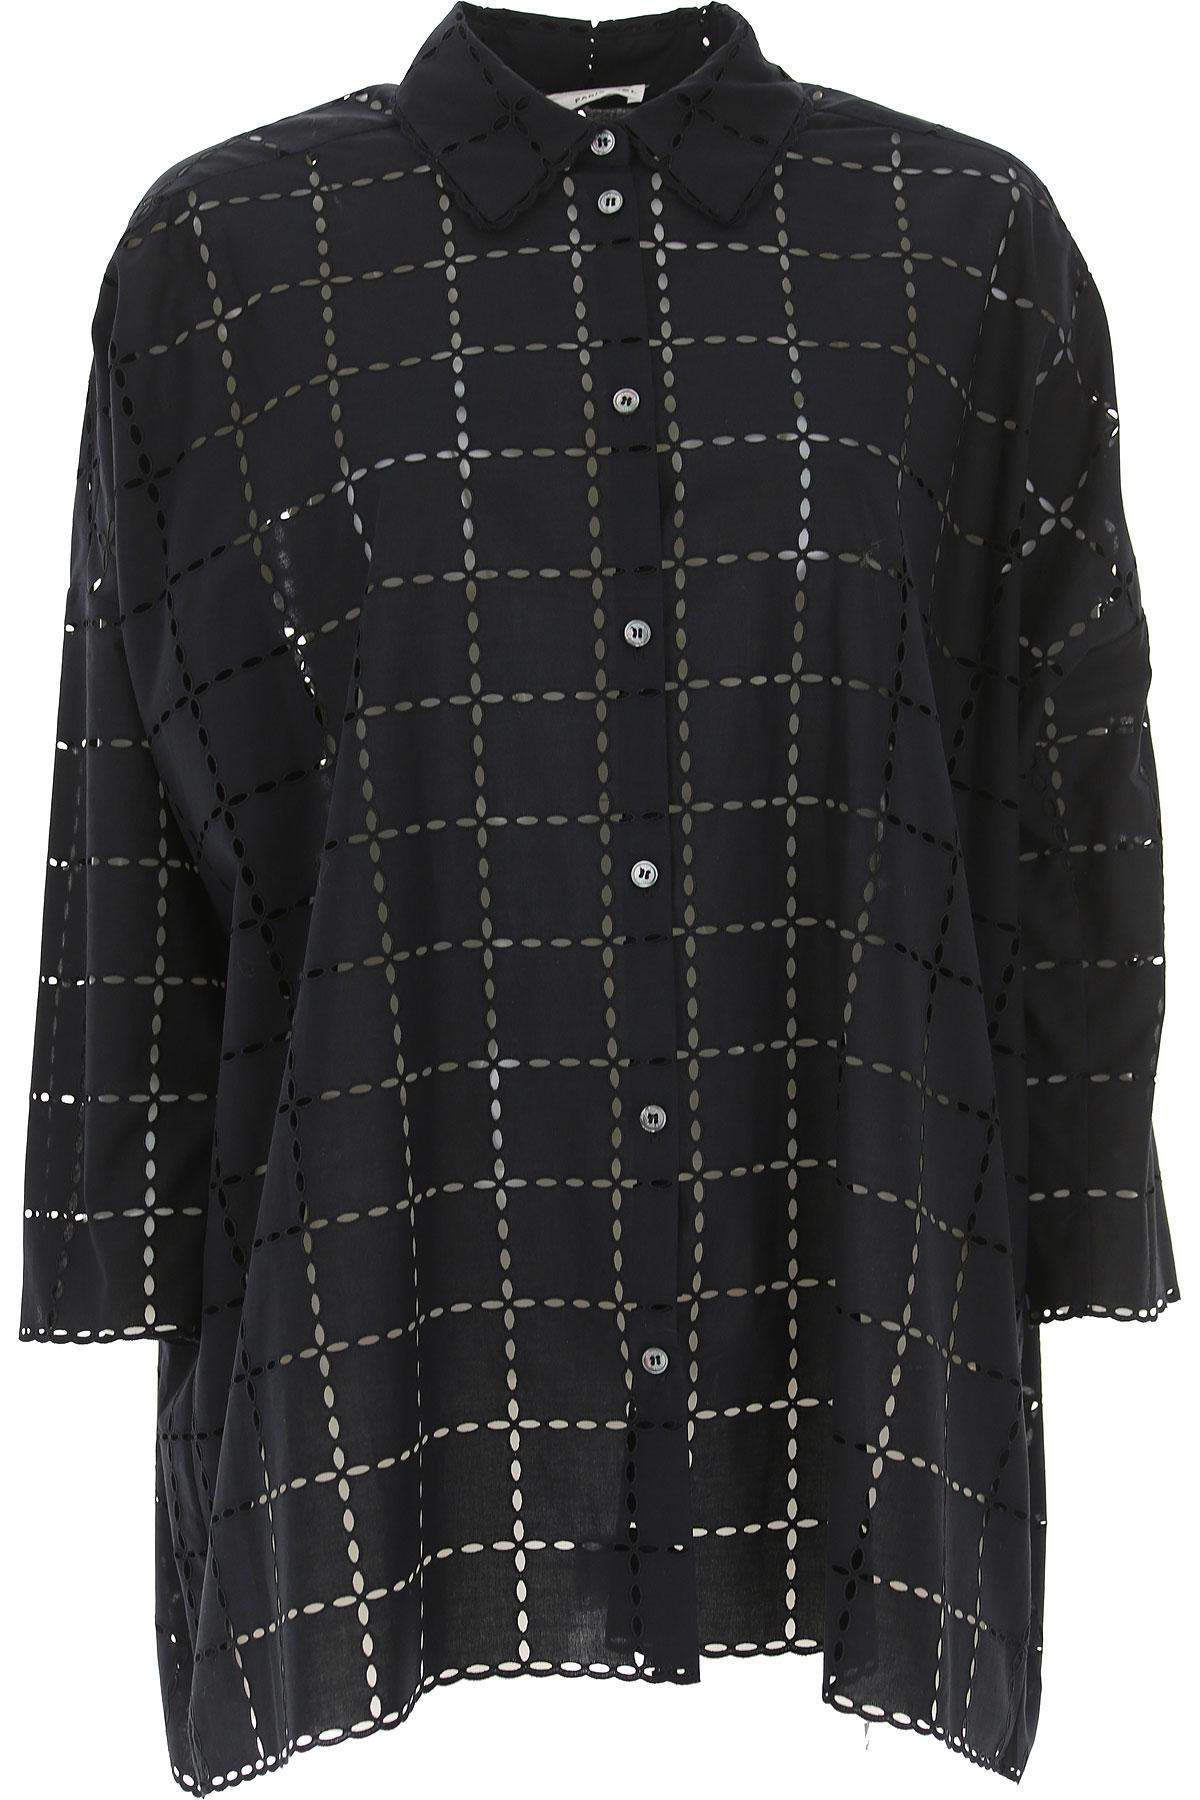 Image of Sonia Rykiel Shirt for Women, Black, Cotton, 2017, 26